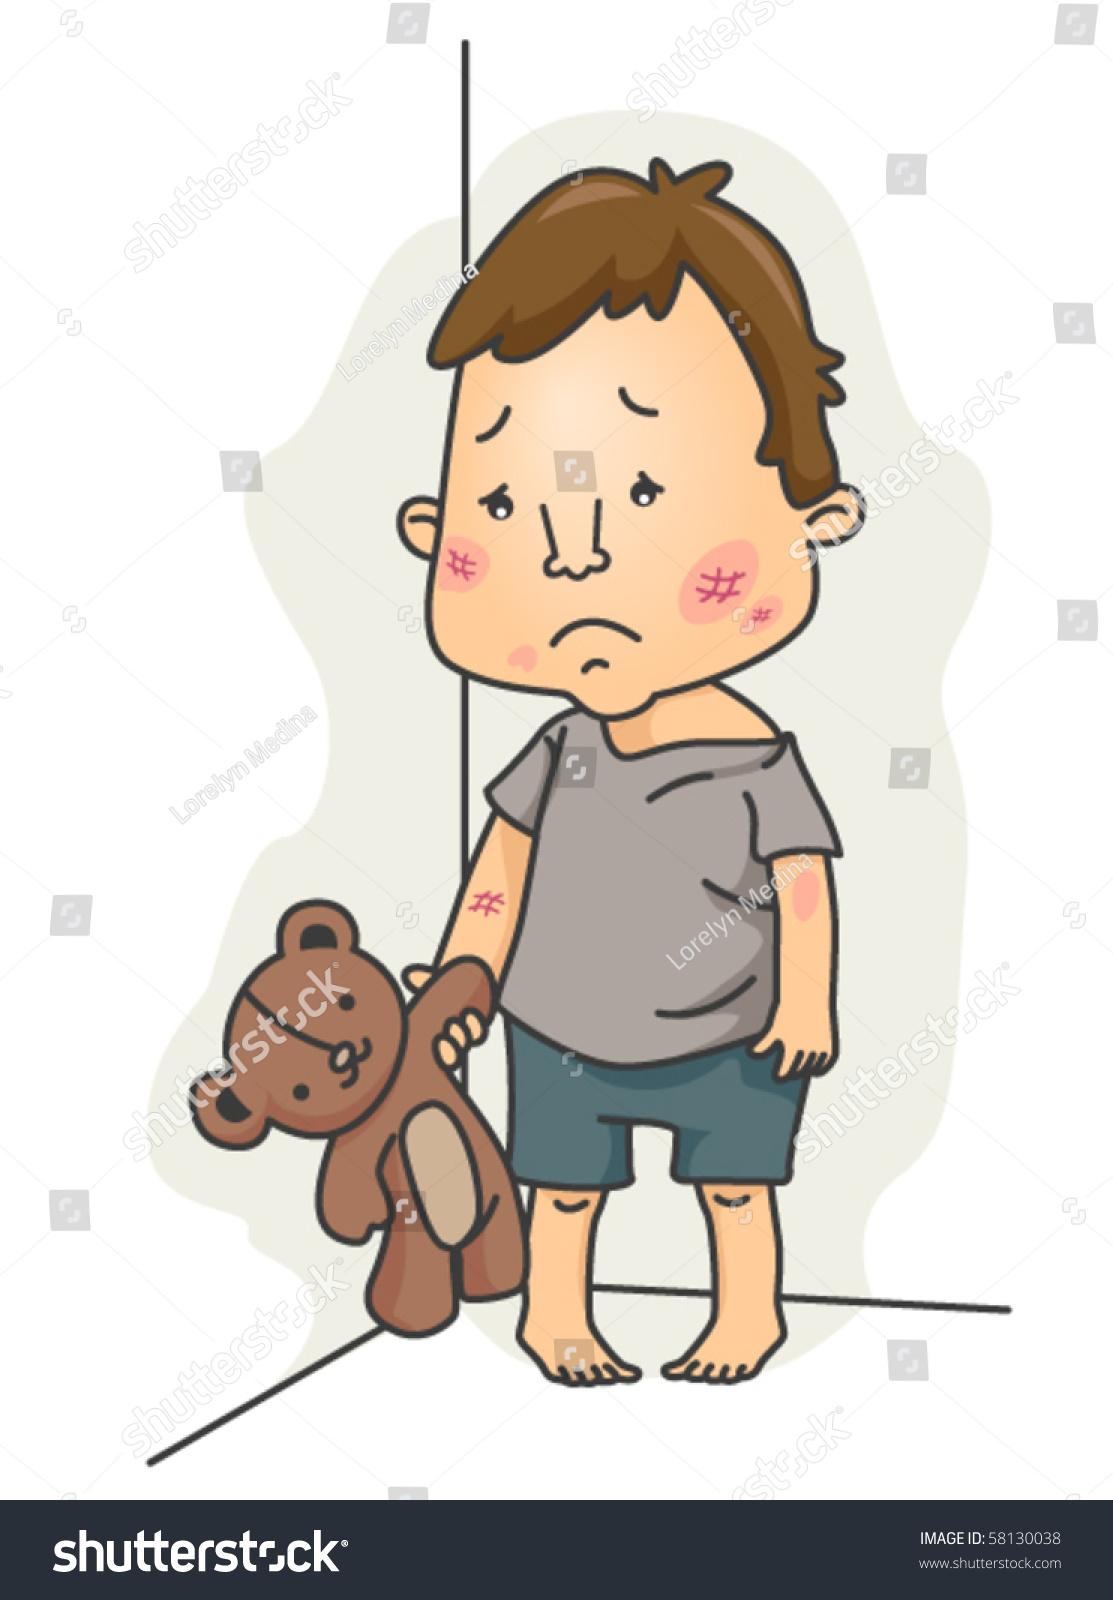 child abuse vector stock vector 2018 58130038 shutterstock rh shutterstock com Abuse Clip Art Black and White Verbal Abuse Clip Art